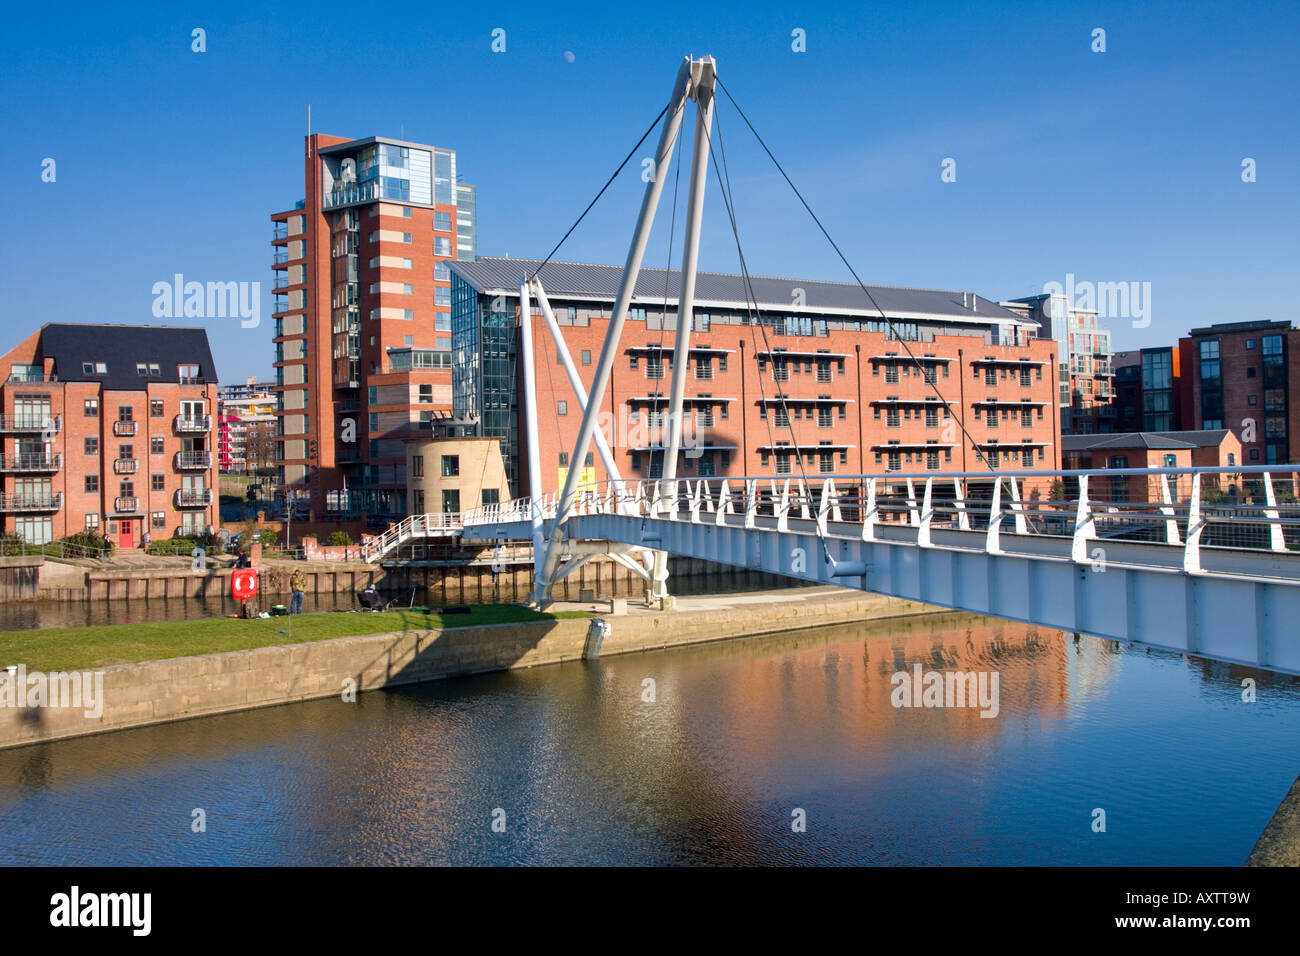 Knightsway Bridge over the River Aire Leeds UK - Stock Image